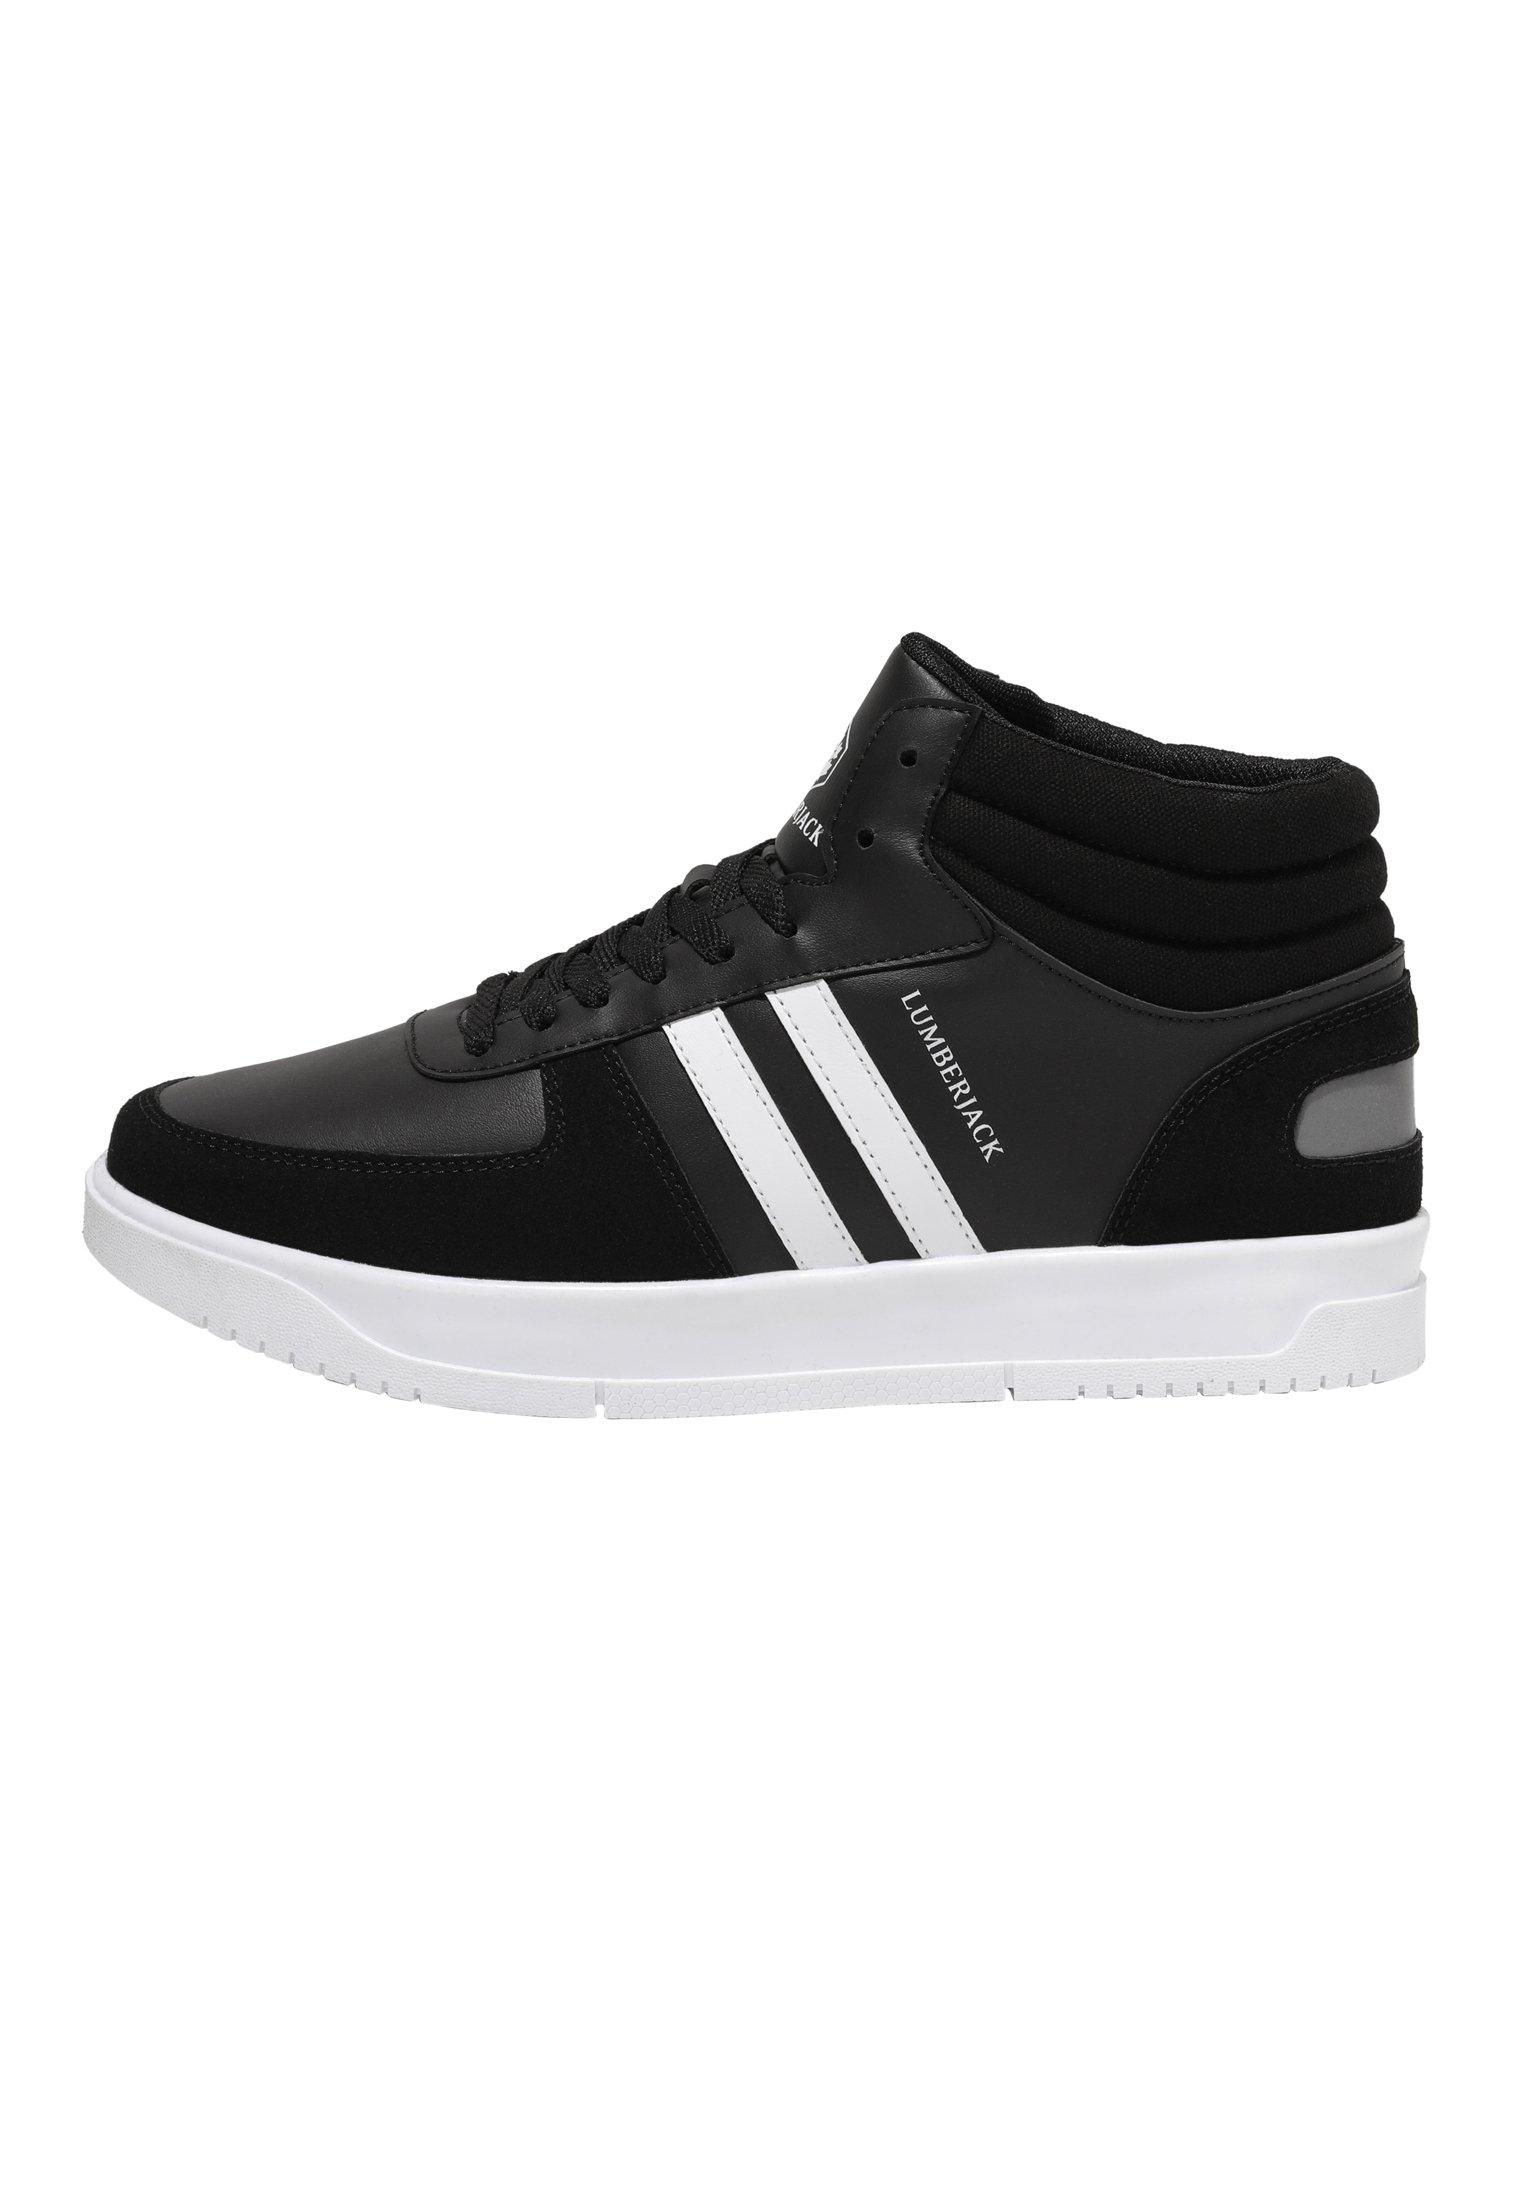 Herren HOOK-AND-LOOP FASTENERS KLAN HI 1FX - Sneaker high